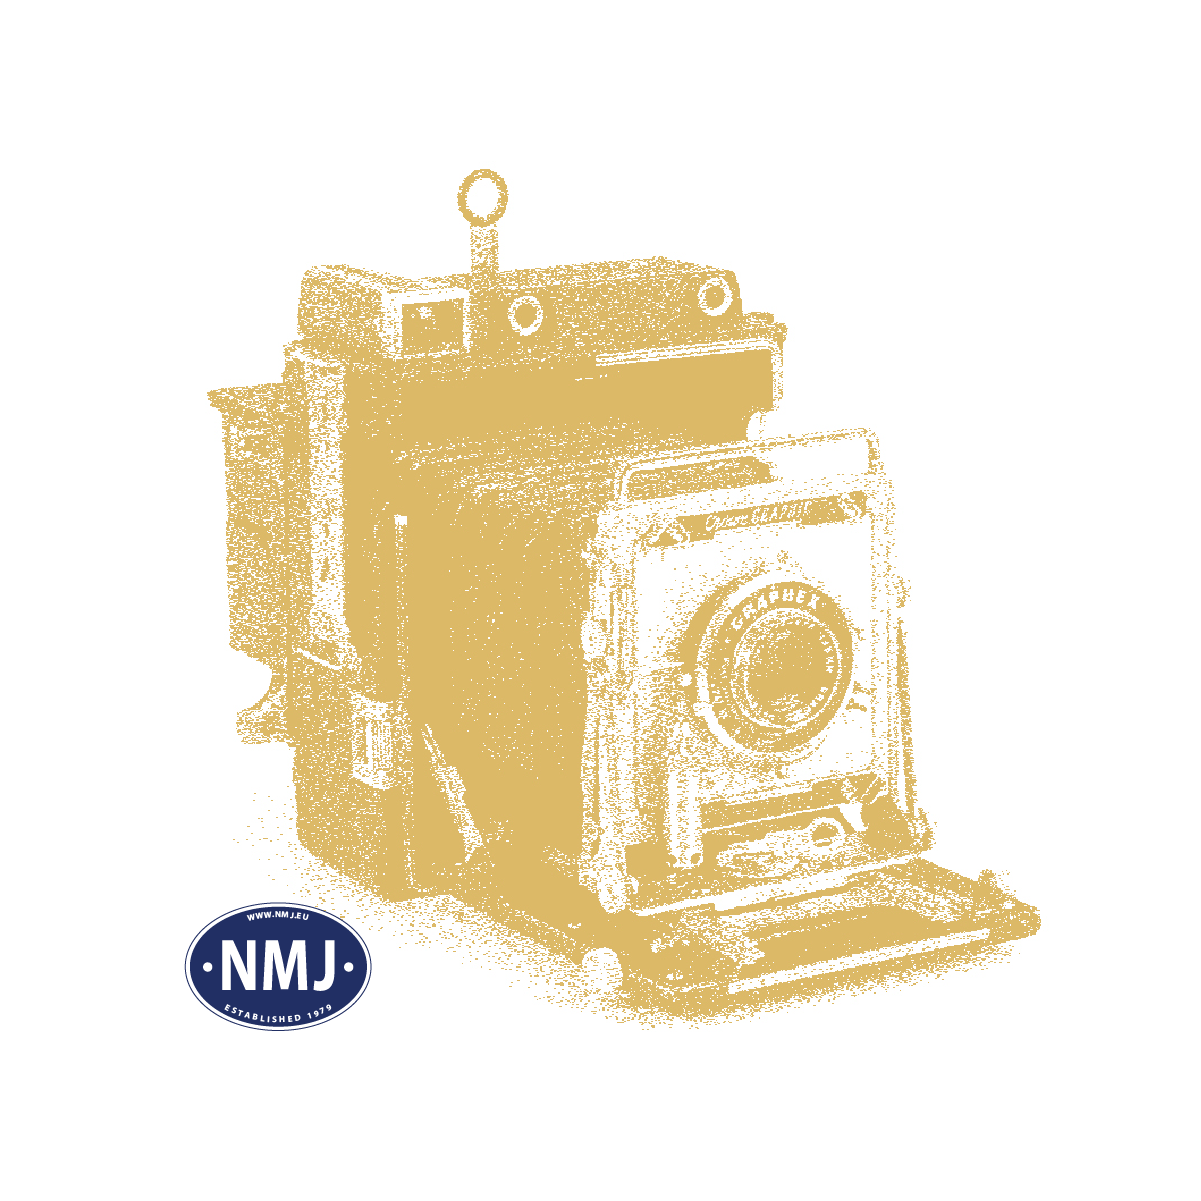 NMJT90015 - NMJ Topline NSB Di3a 616 nydesign, DCC m/ Sound